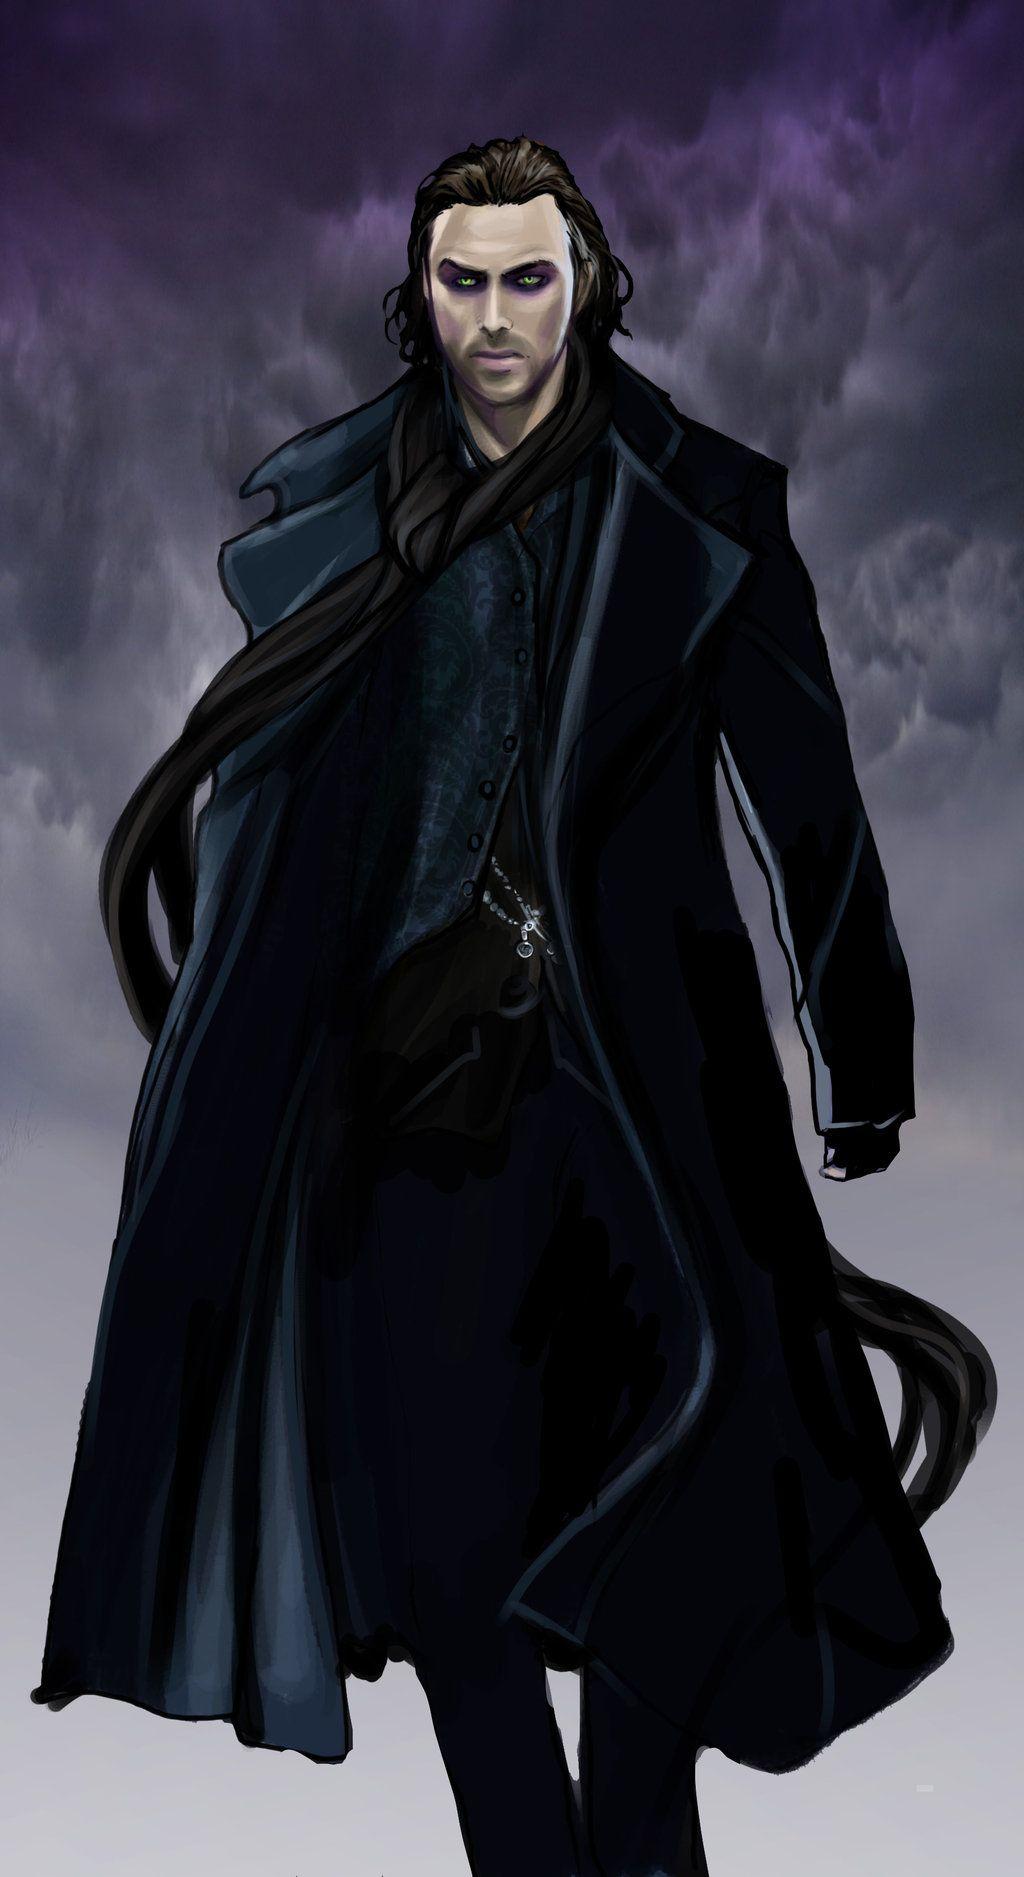 Mage Thedarkestseason Deviantart Characters Arcane In 2019 Modern Vampires